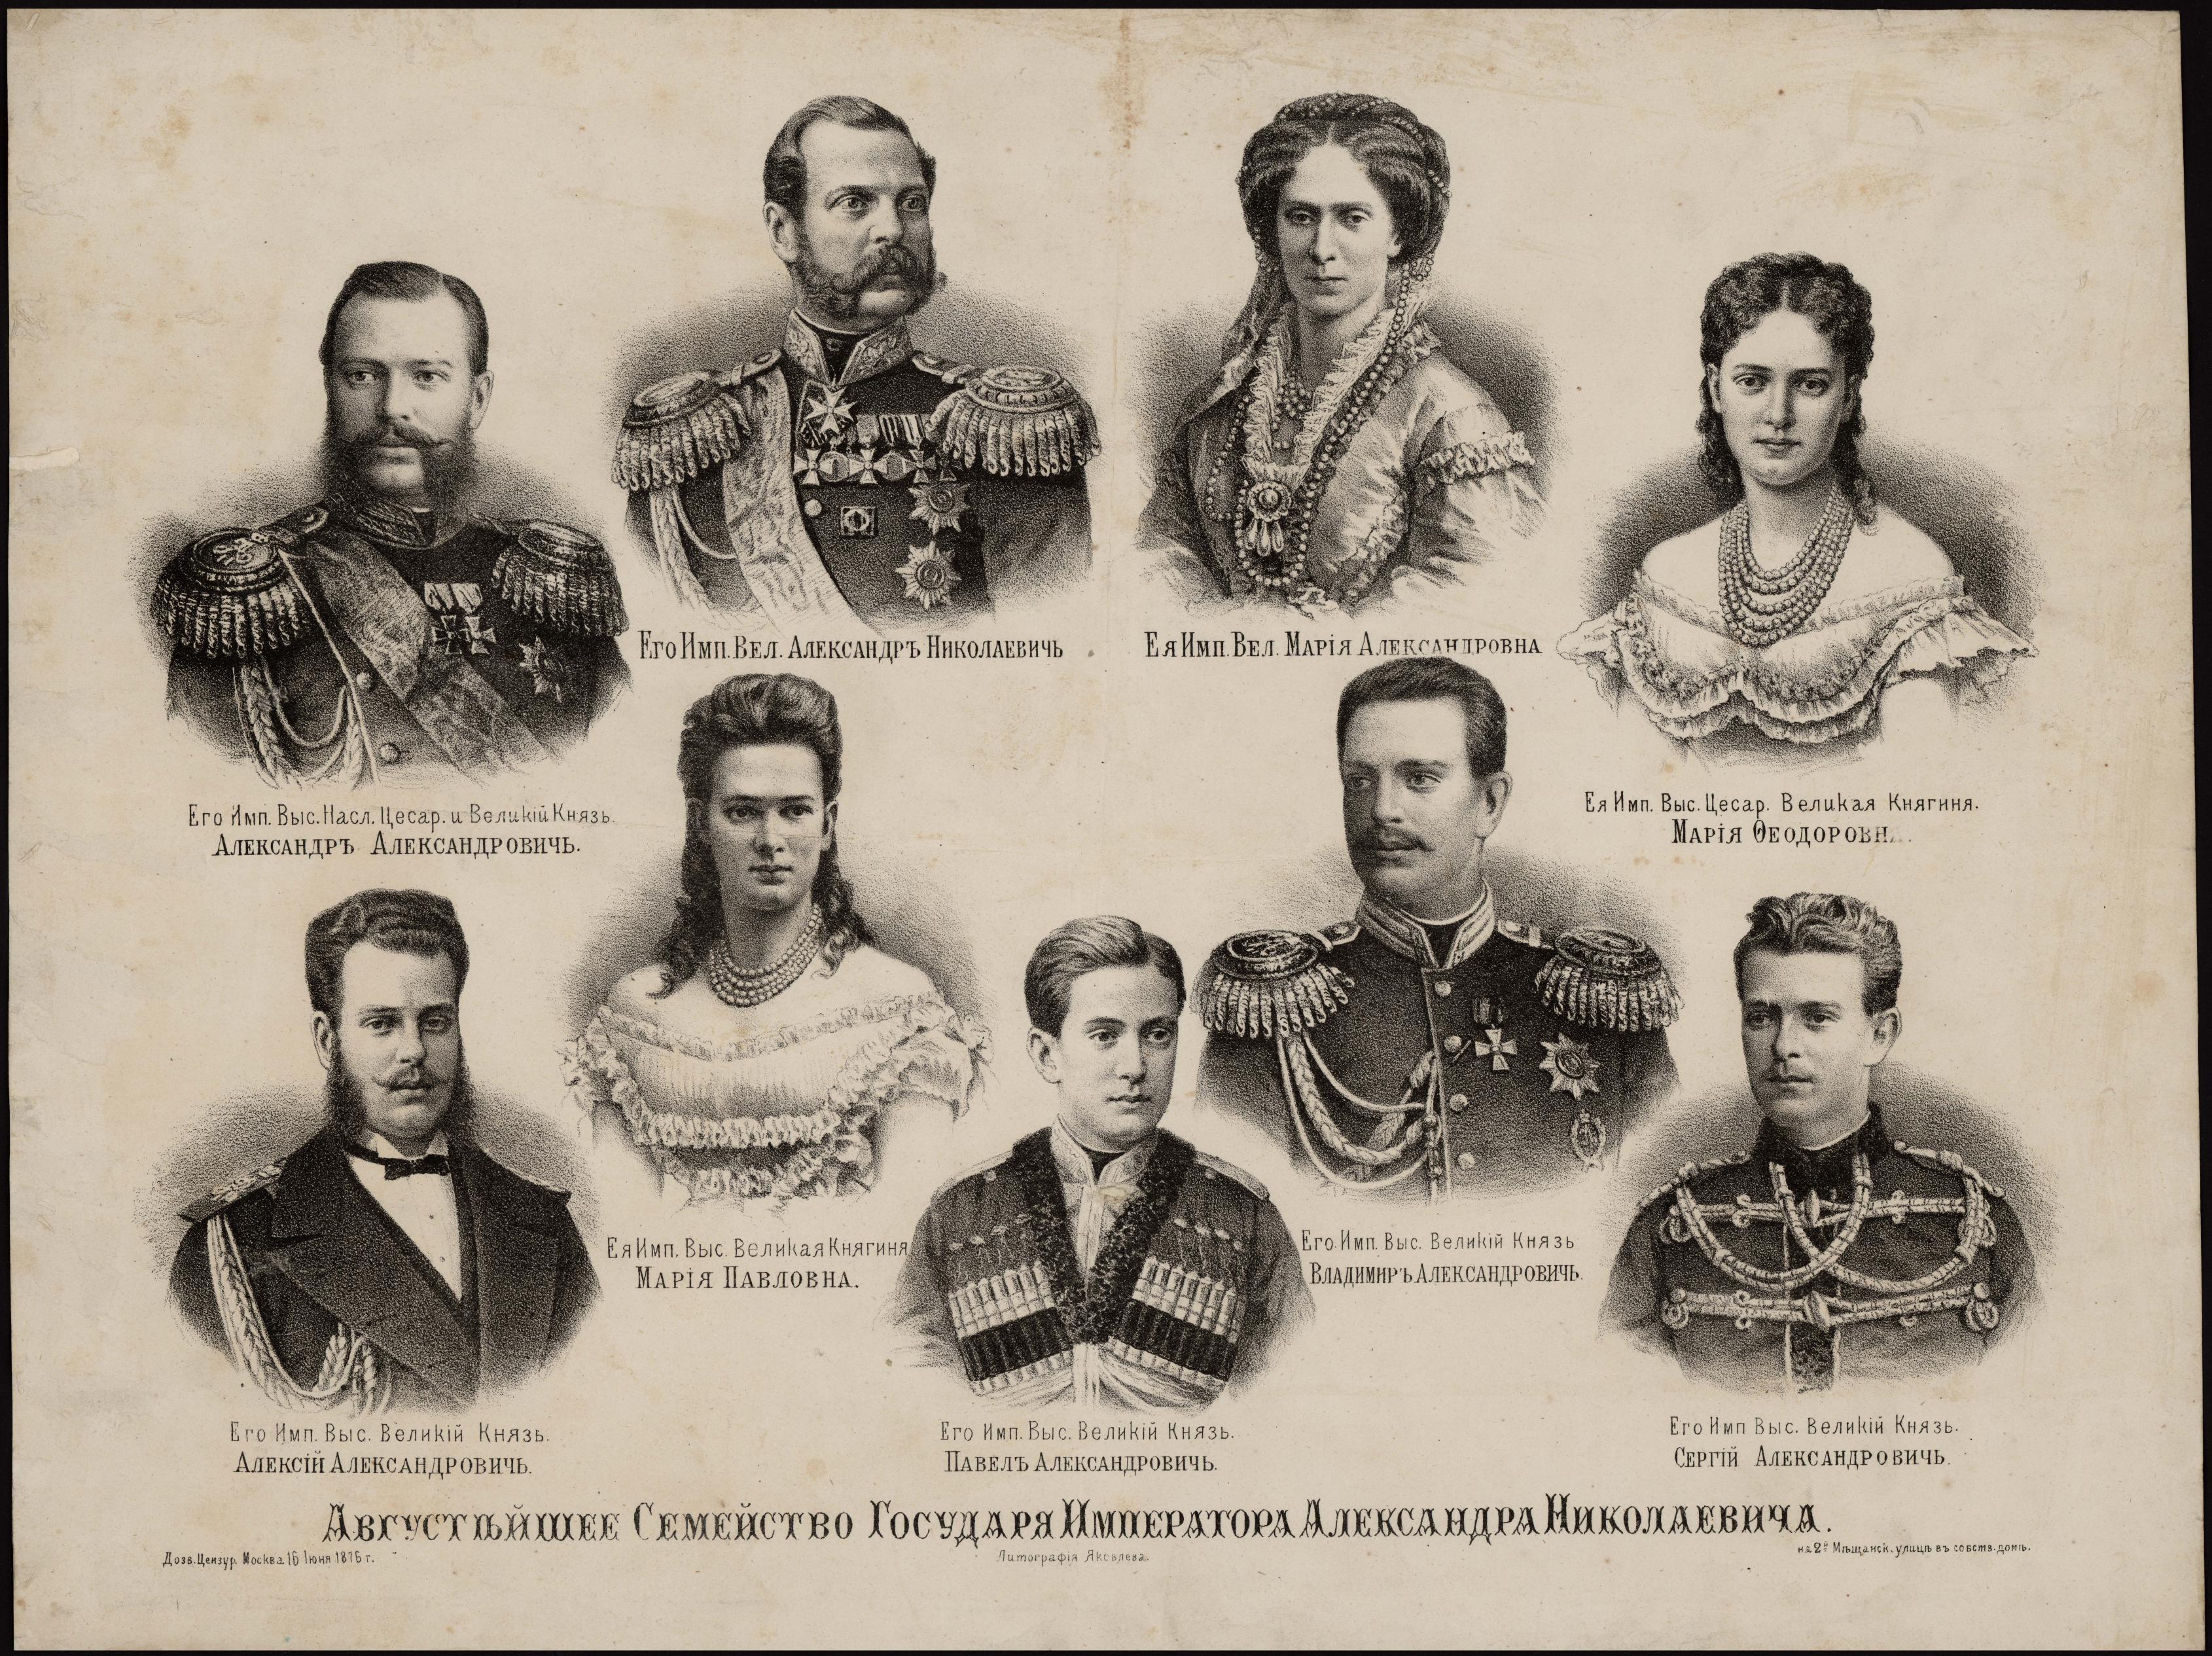 1876. Августейшее семейство Государя Императора Александра Николаевича